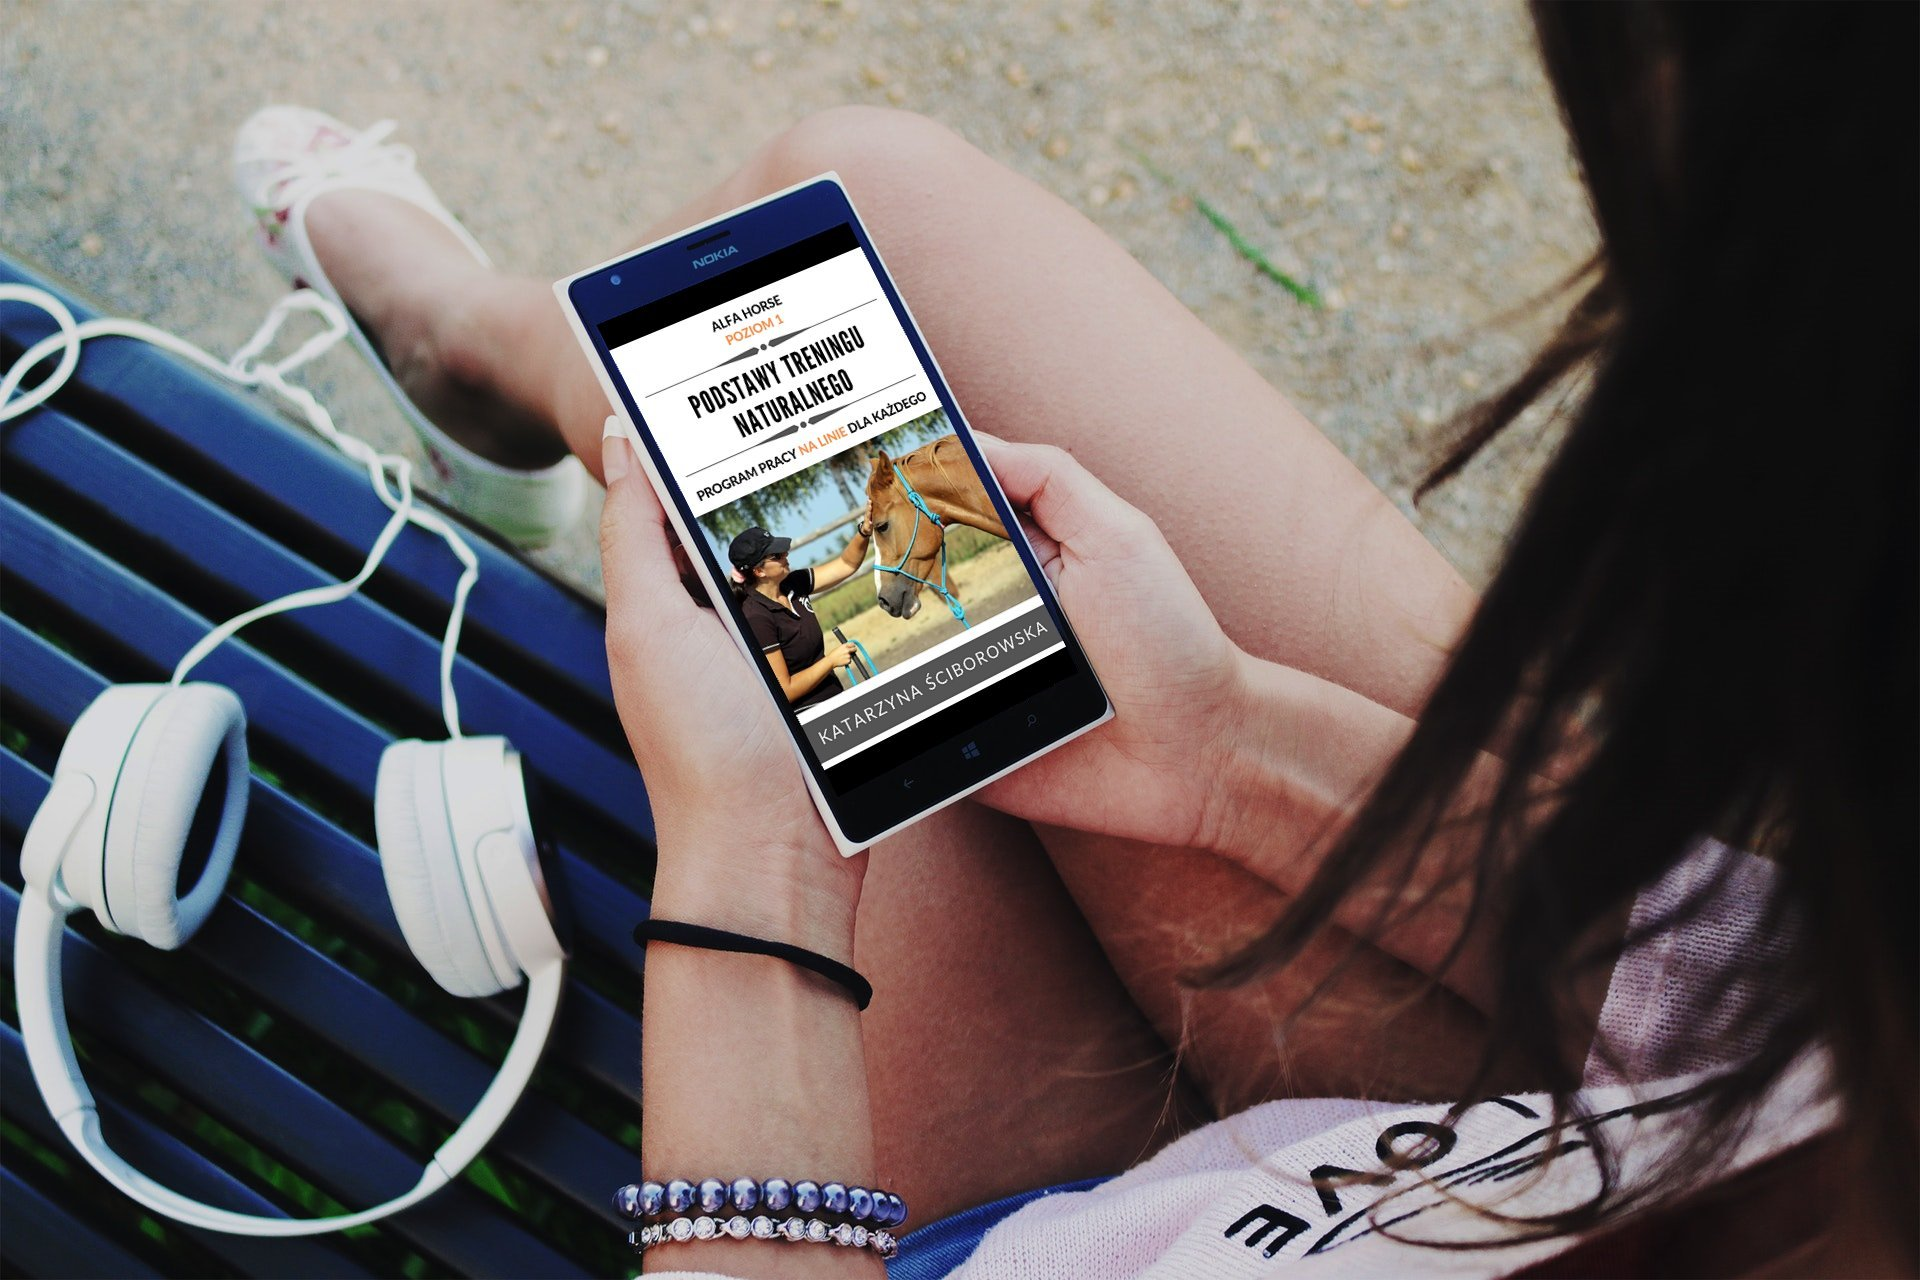 audiobook_podstawy_treningu_naturalnego_koni_2